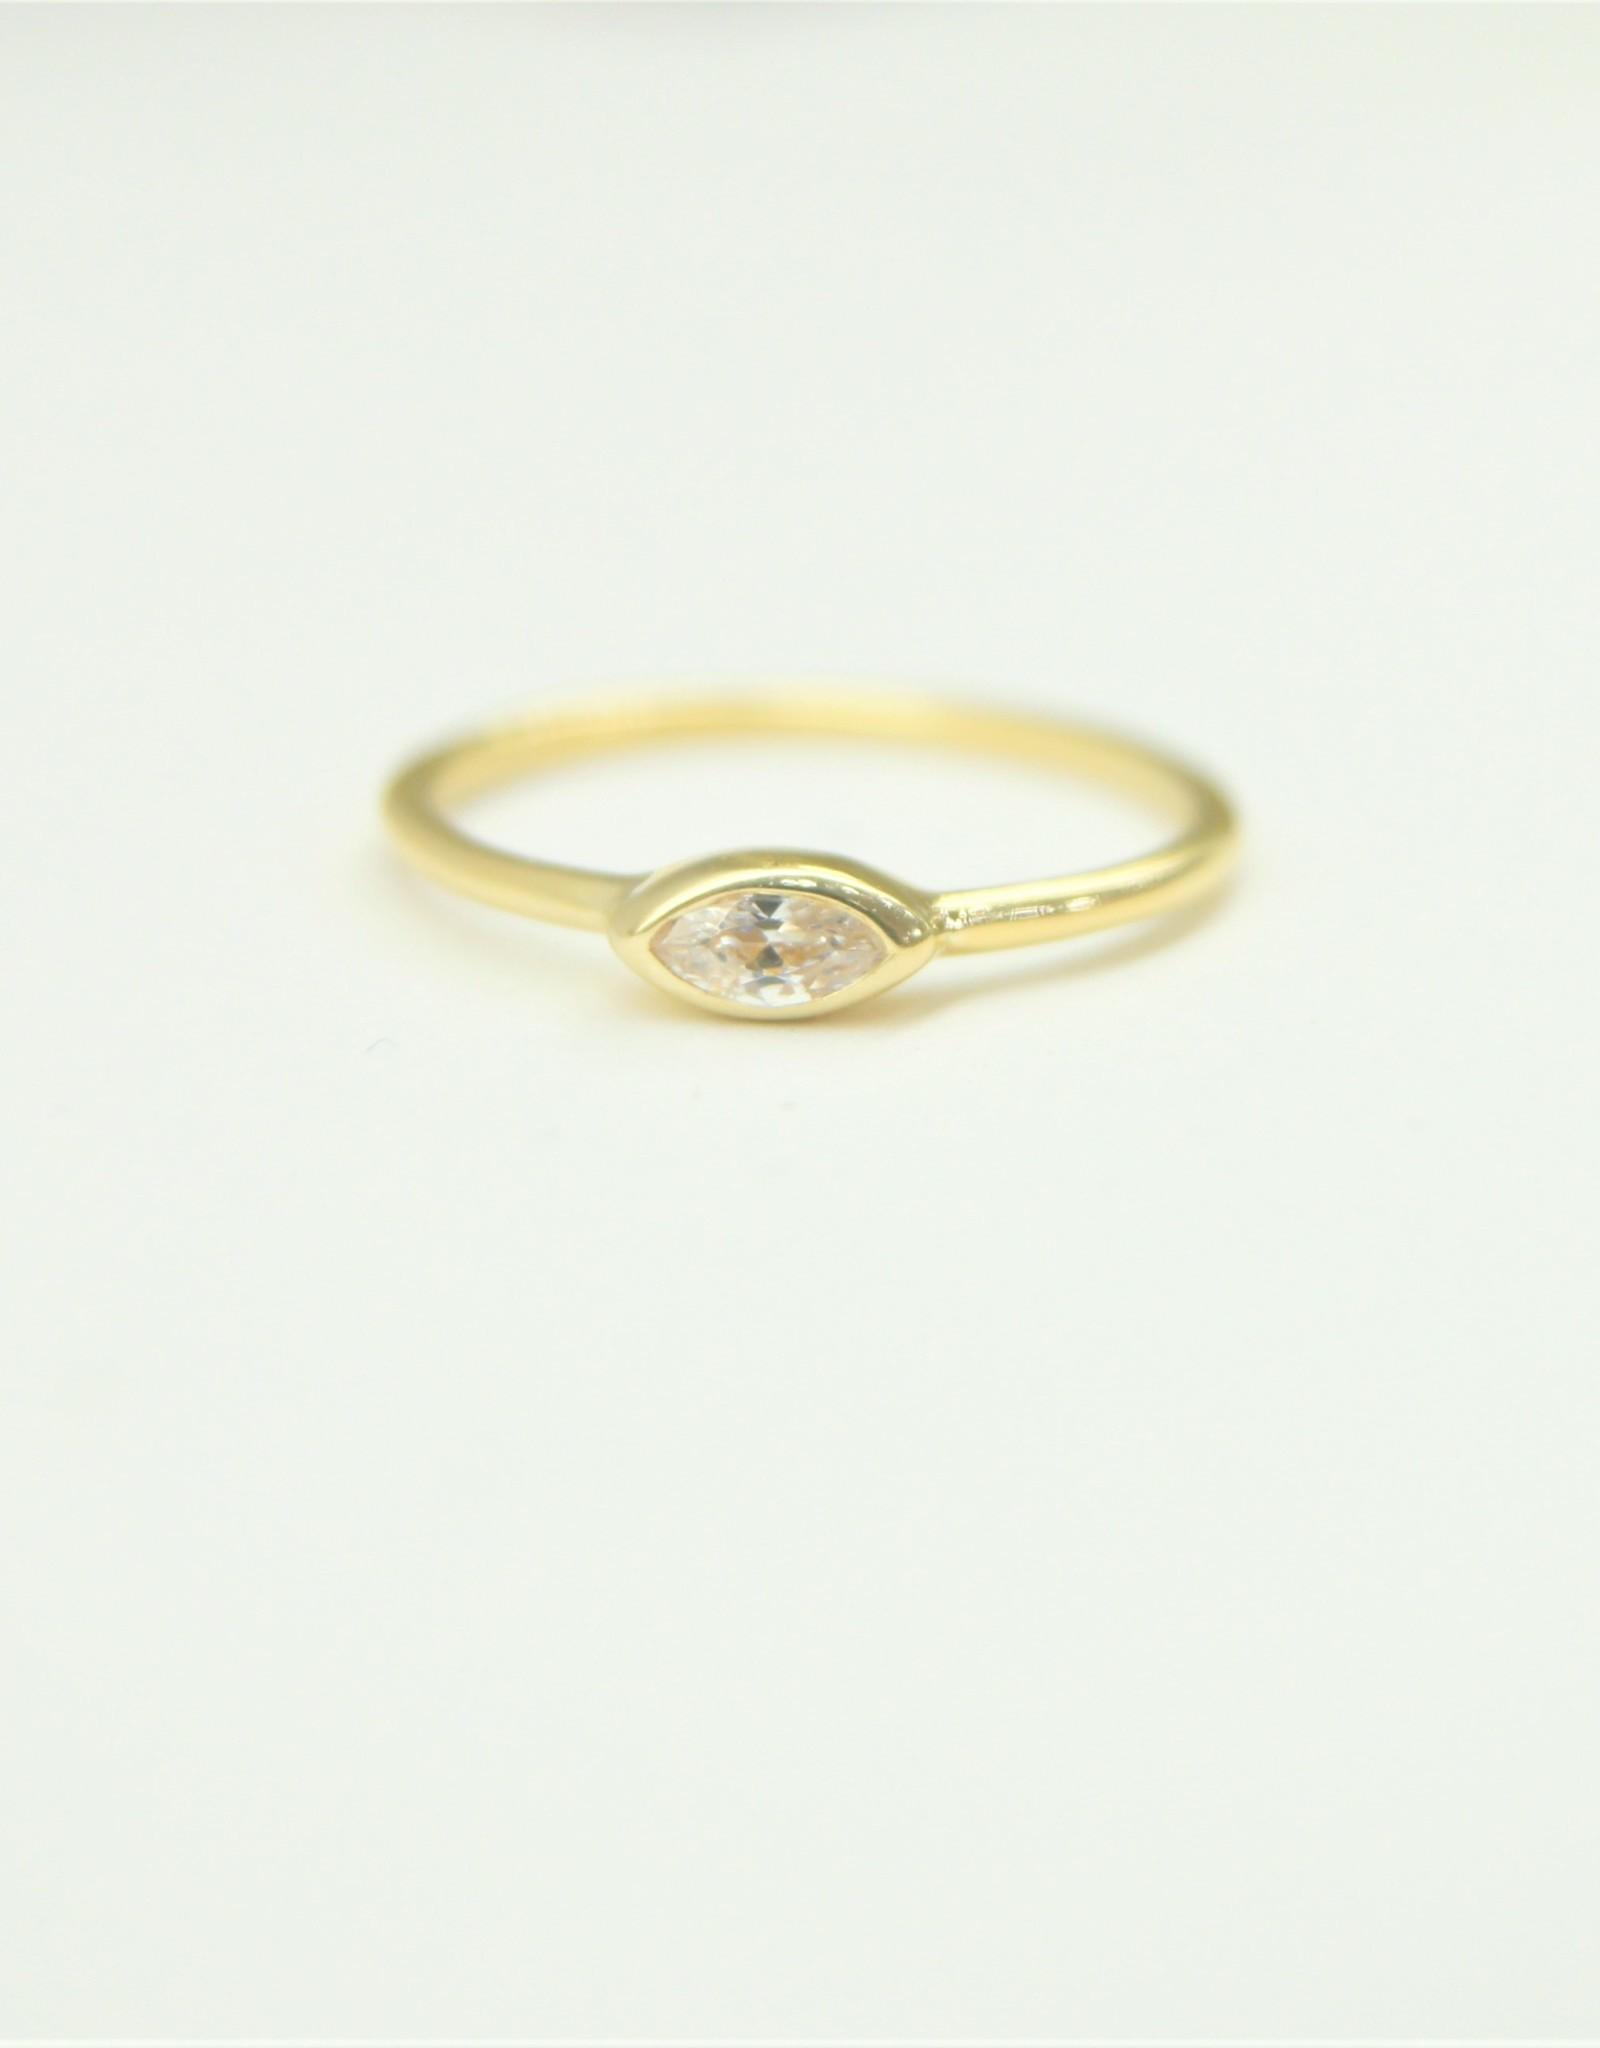 Tashi Bezel-Set Marquis with Cubic Zirconia Stacking Ring